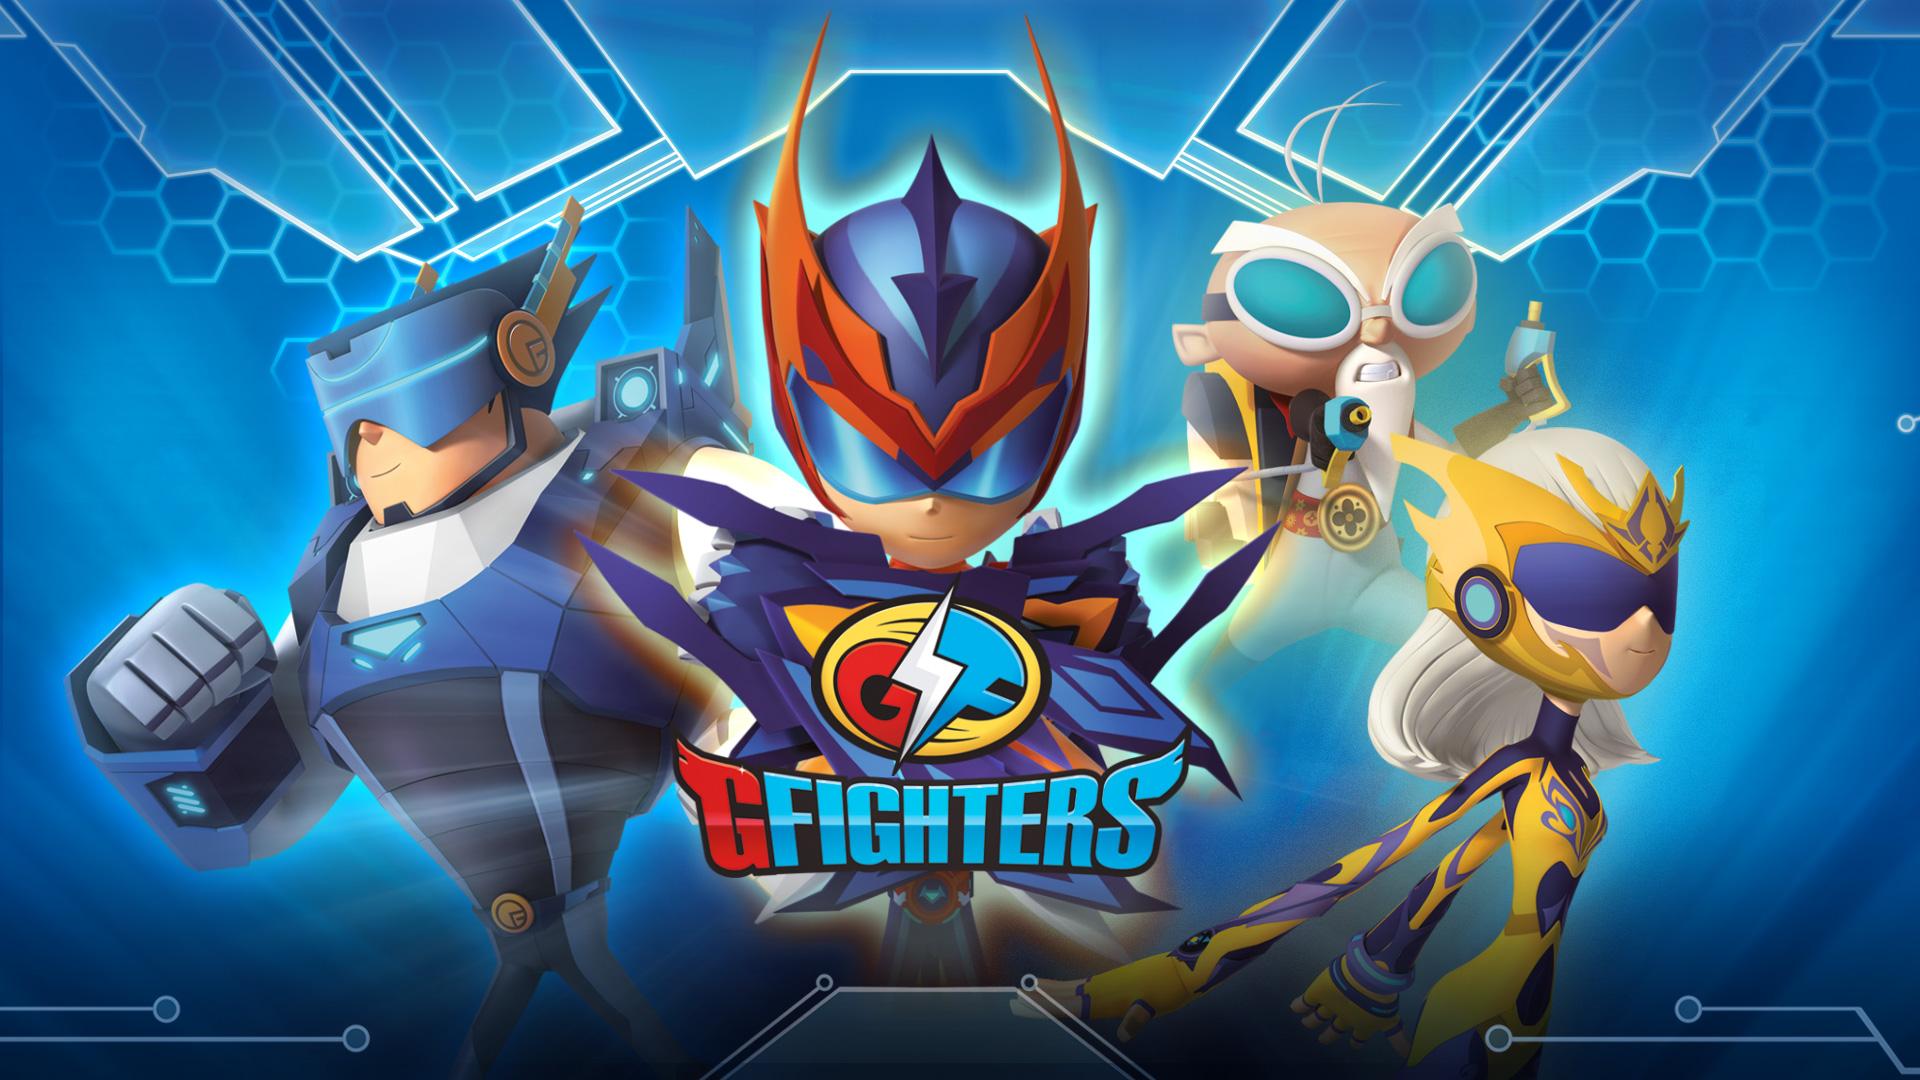 G-fighters - Season 1